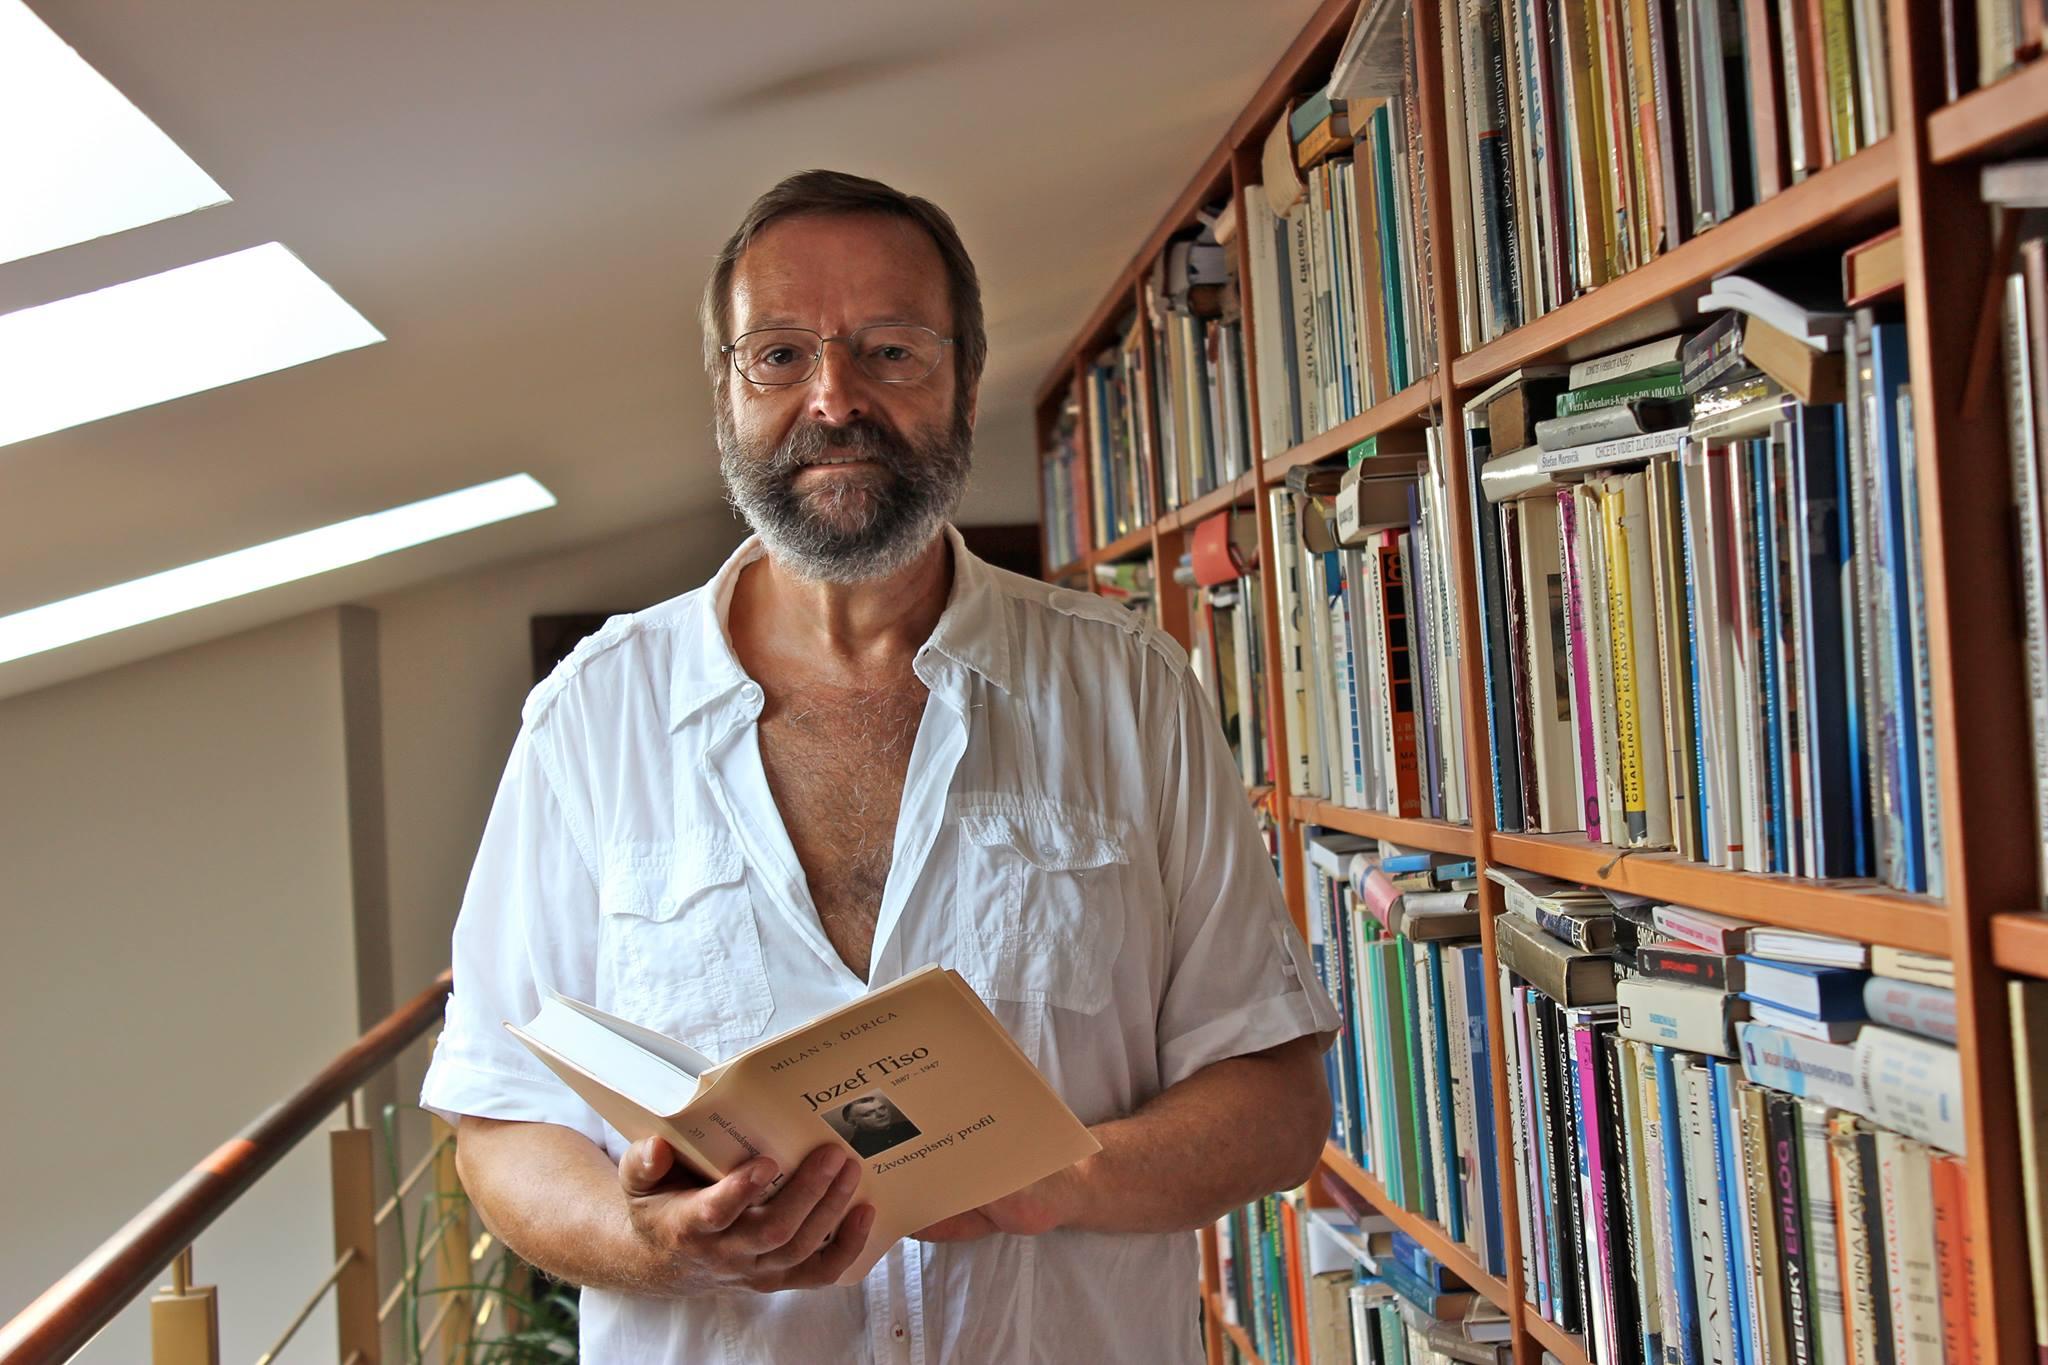 Jozef Šimonovič